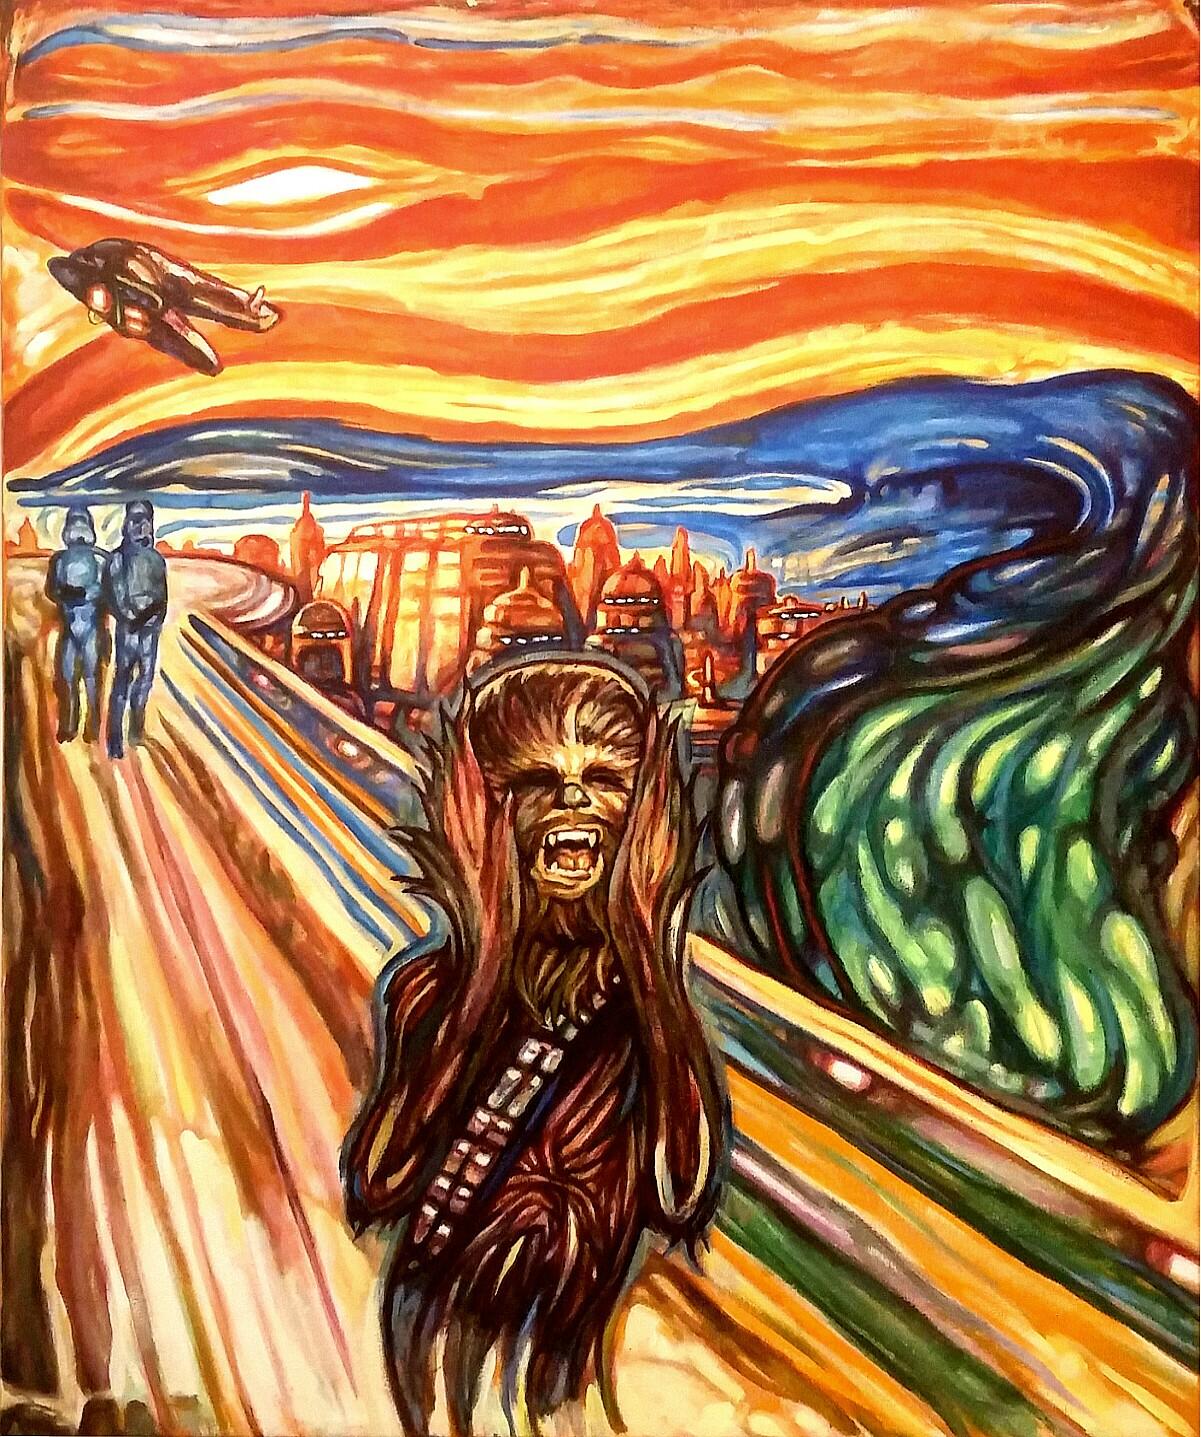 Wookiee's Scream,David Blancas, 2015. Courtesy Photo.